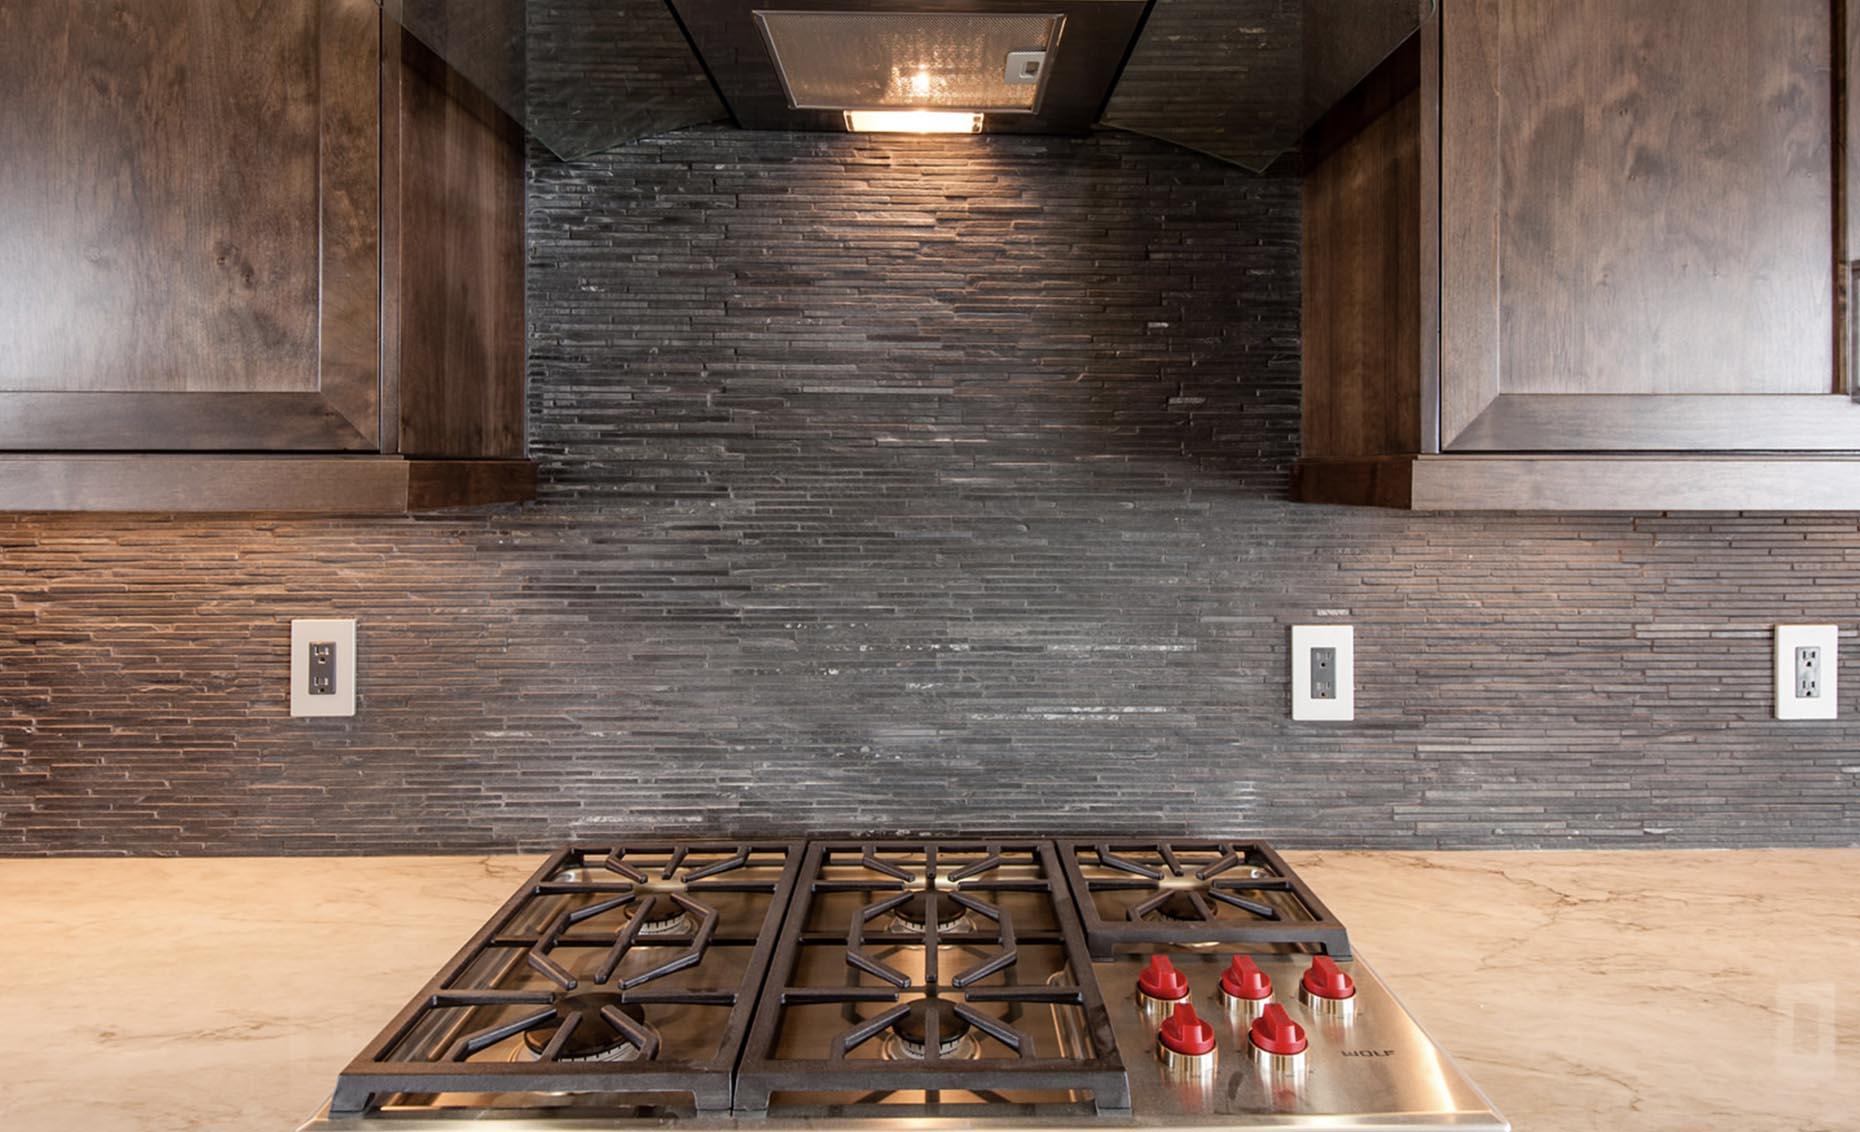 The Corrente Bello House Kitchen Stovetop